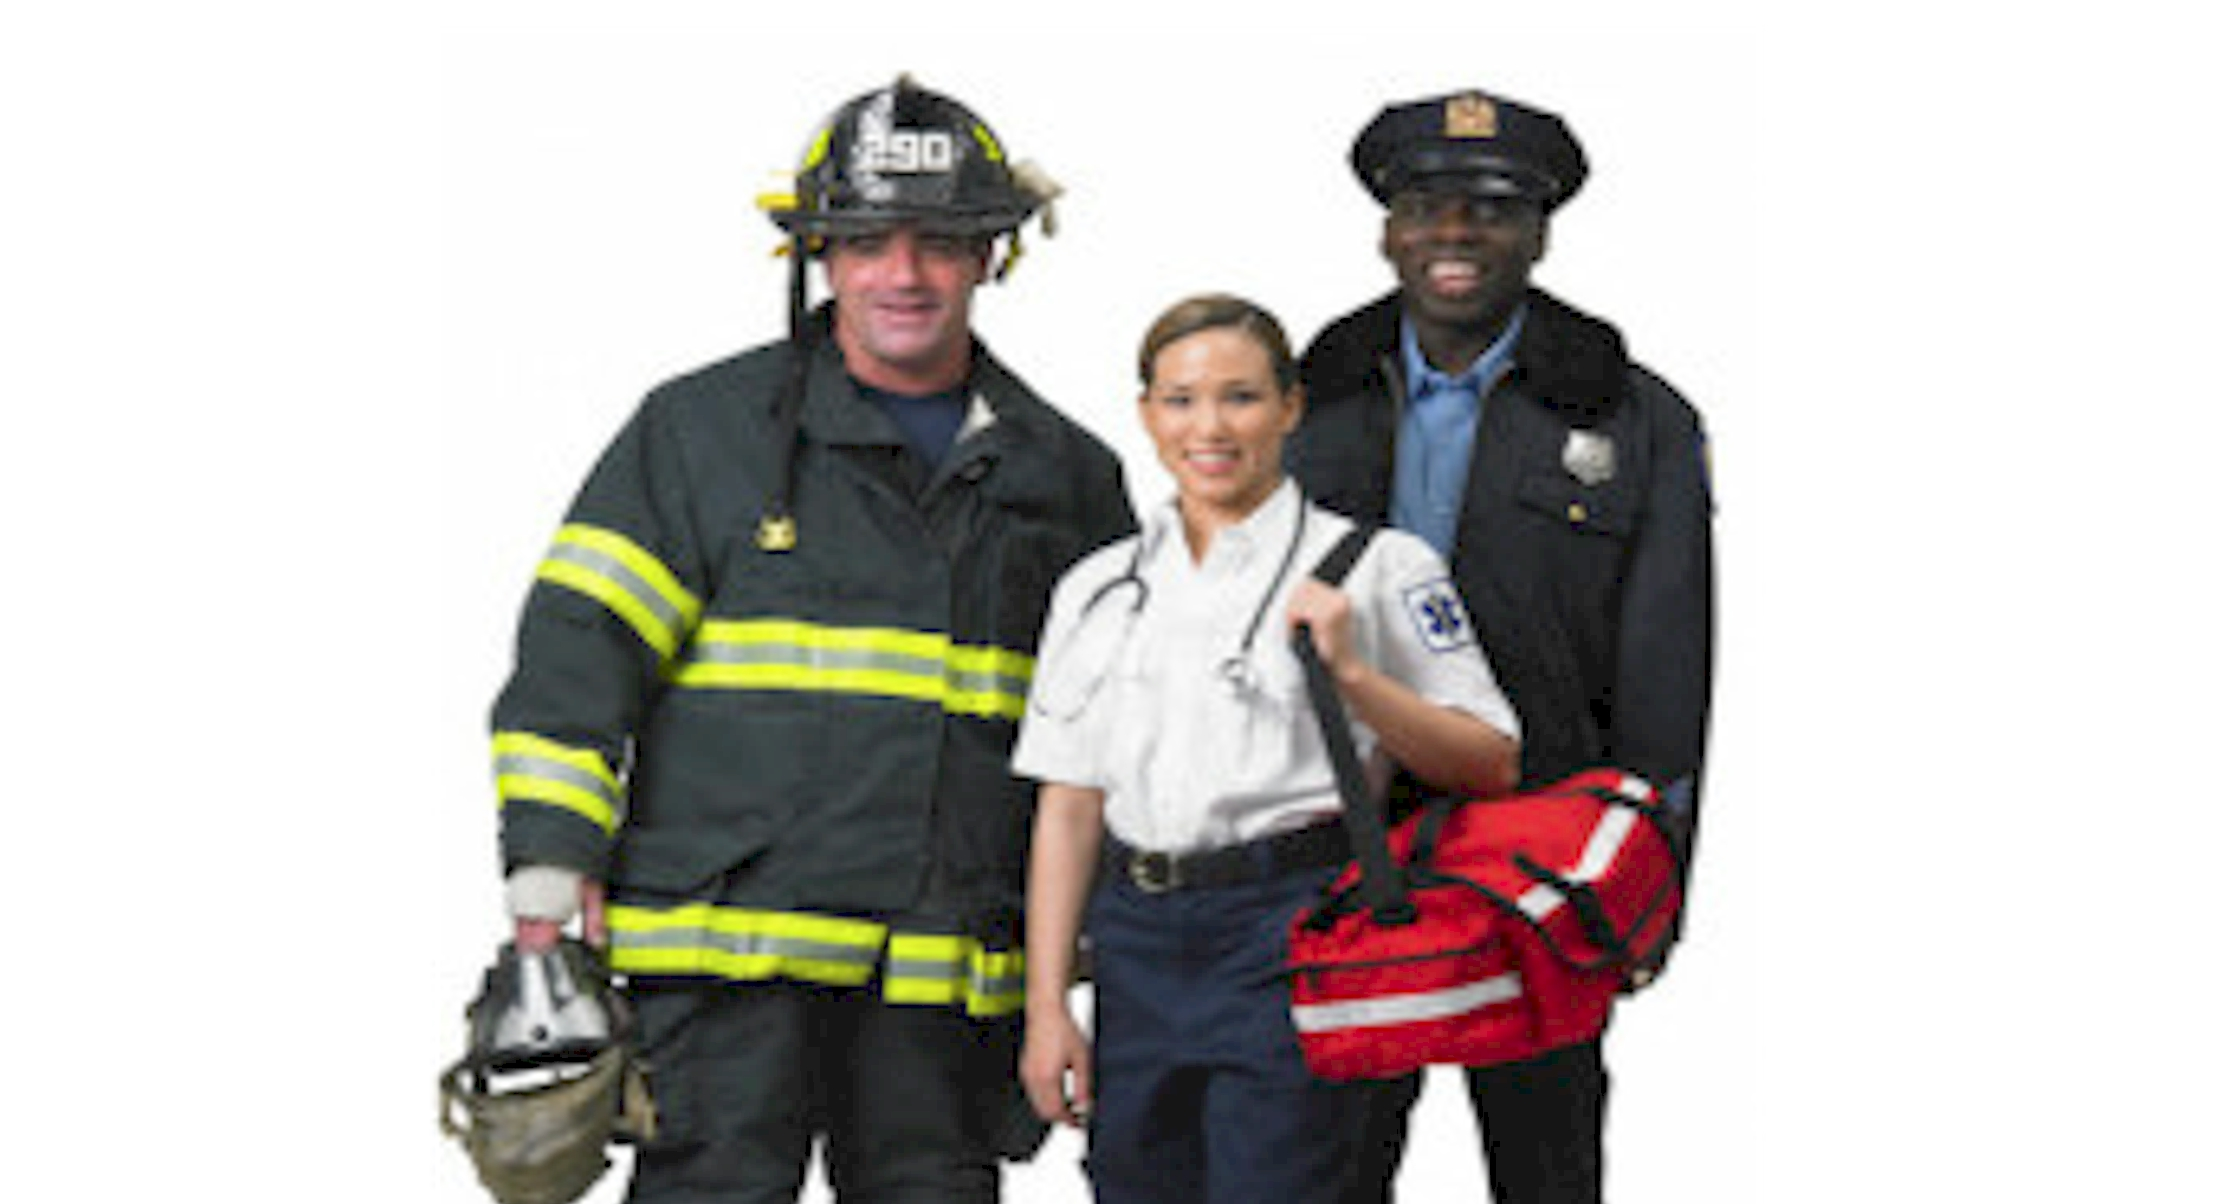 Firemen & EMS Group